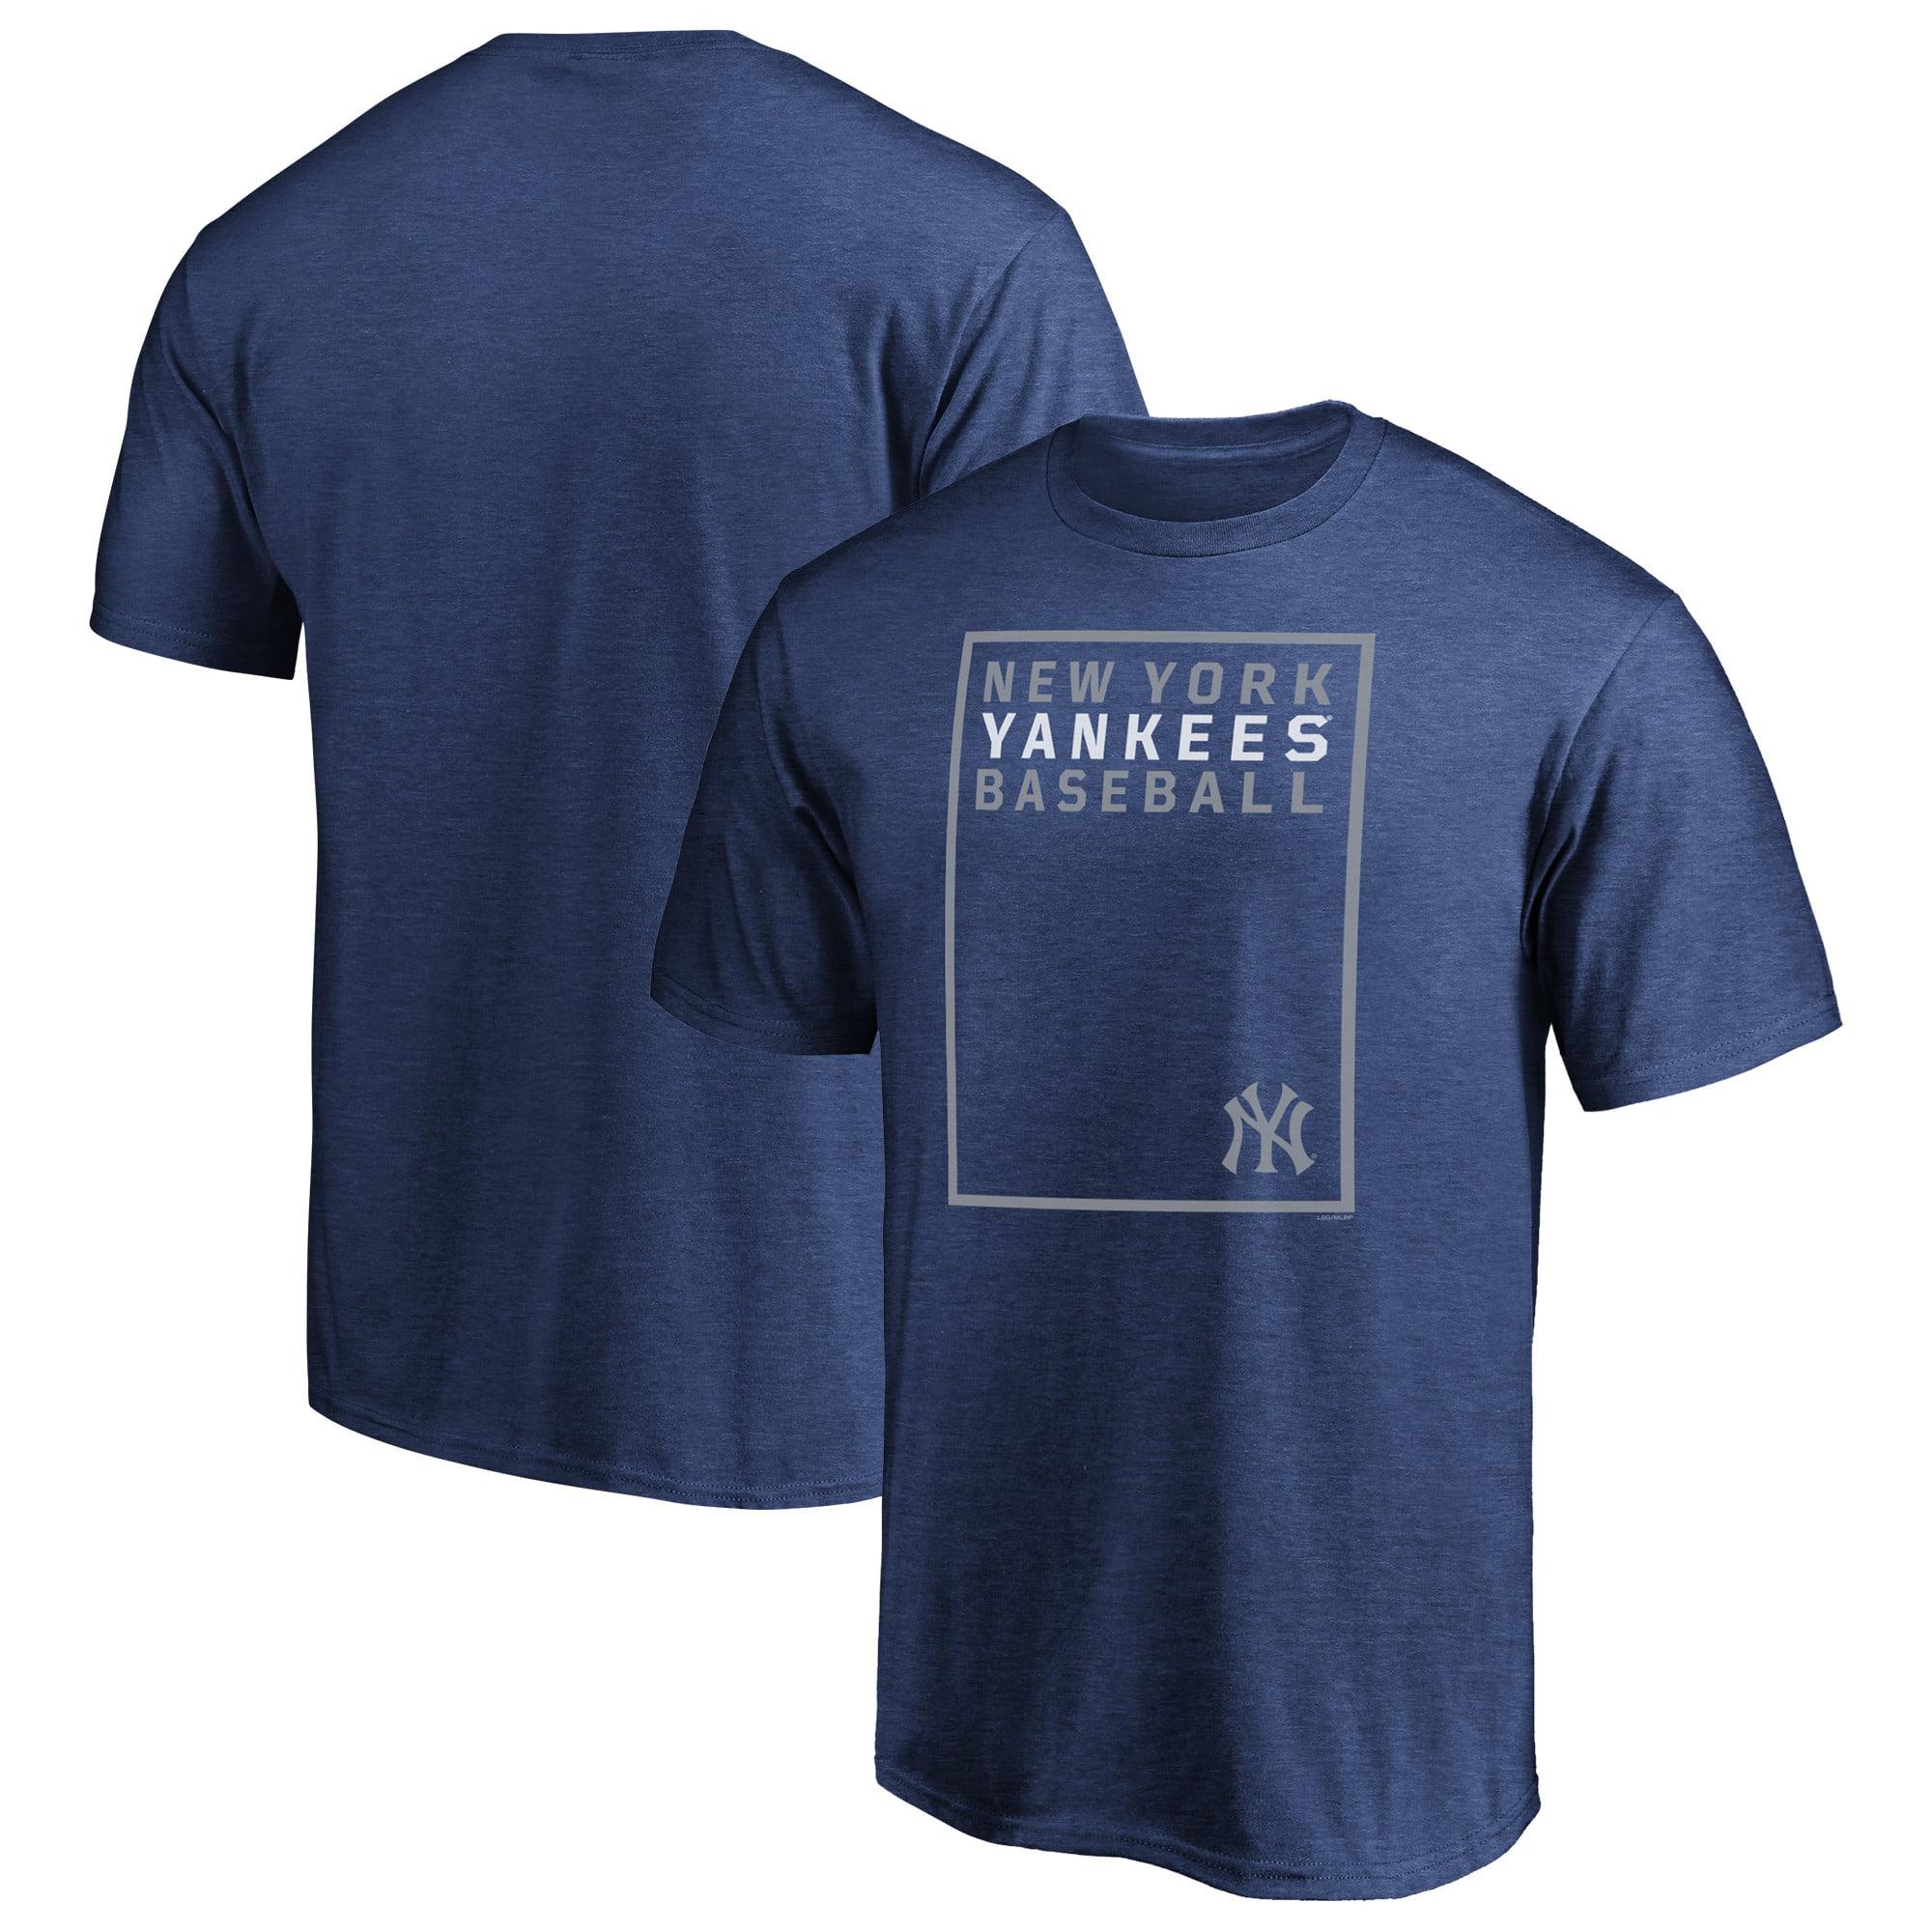 981c264ff New York Yankees Team Shop - Walmart.com